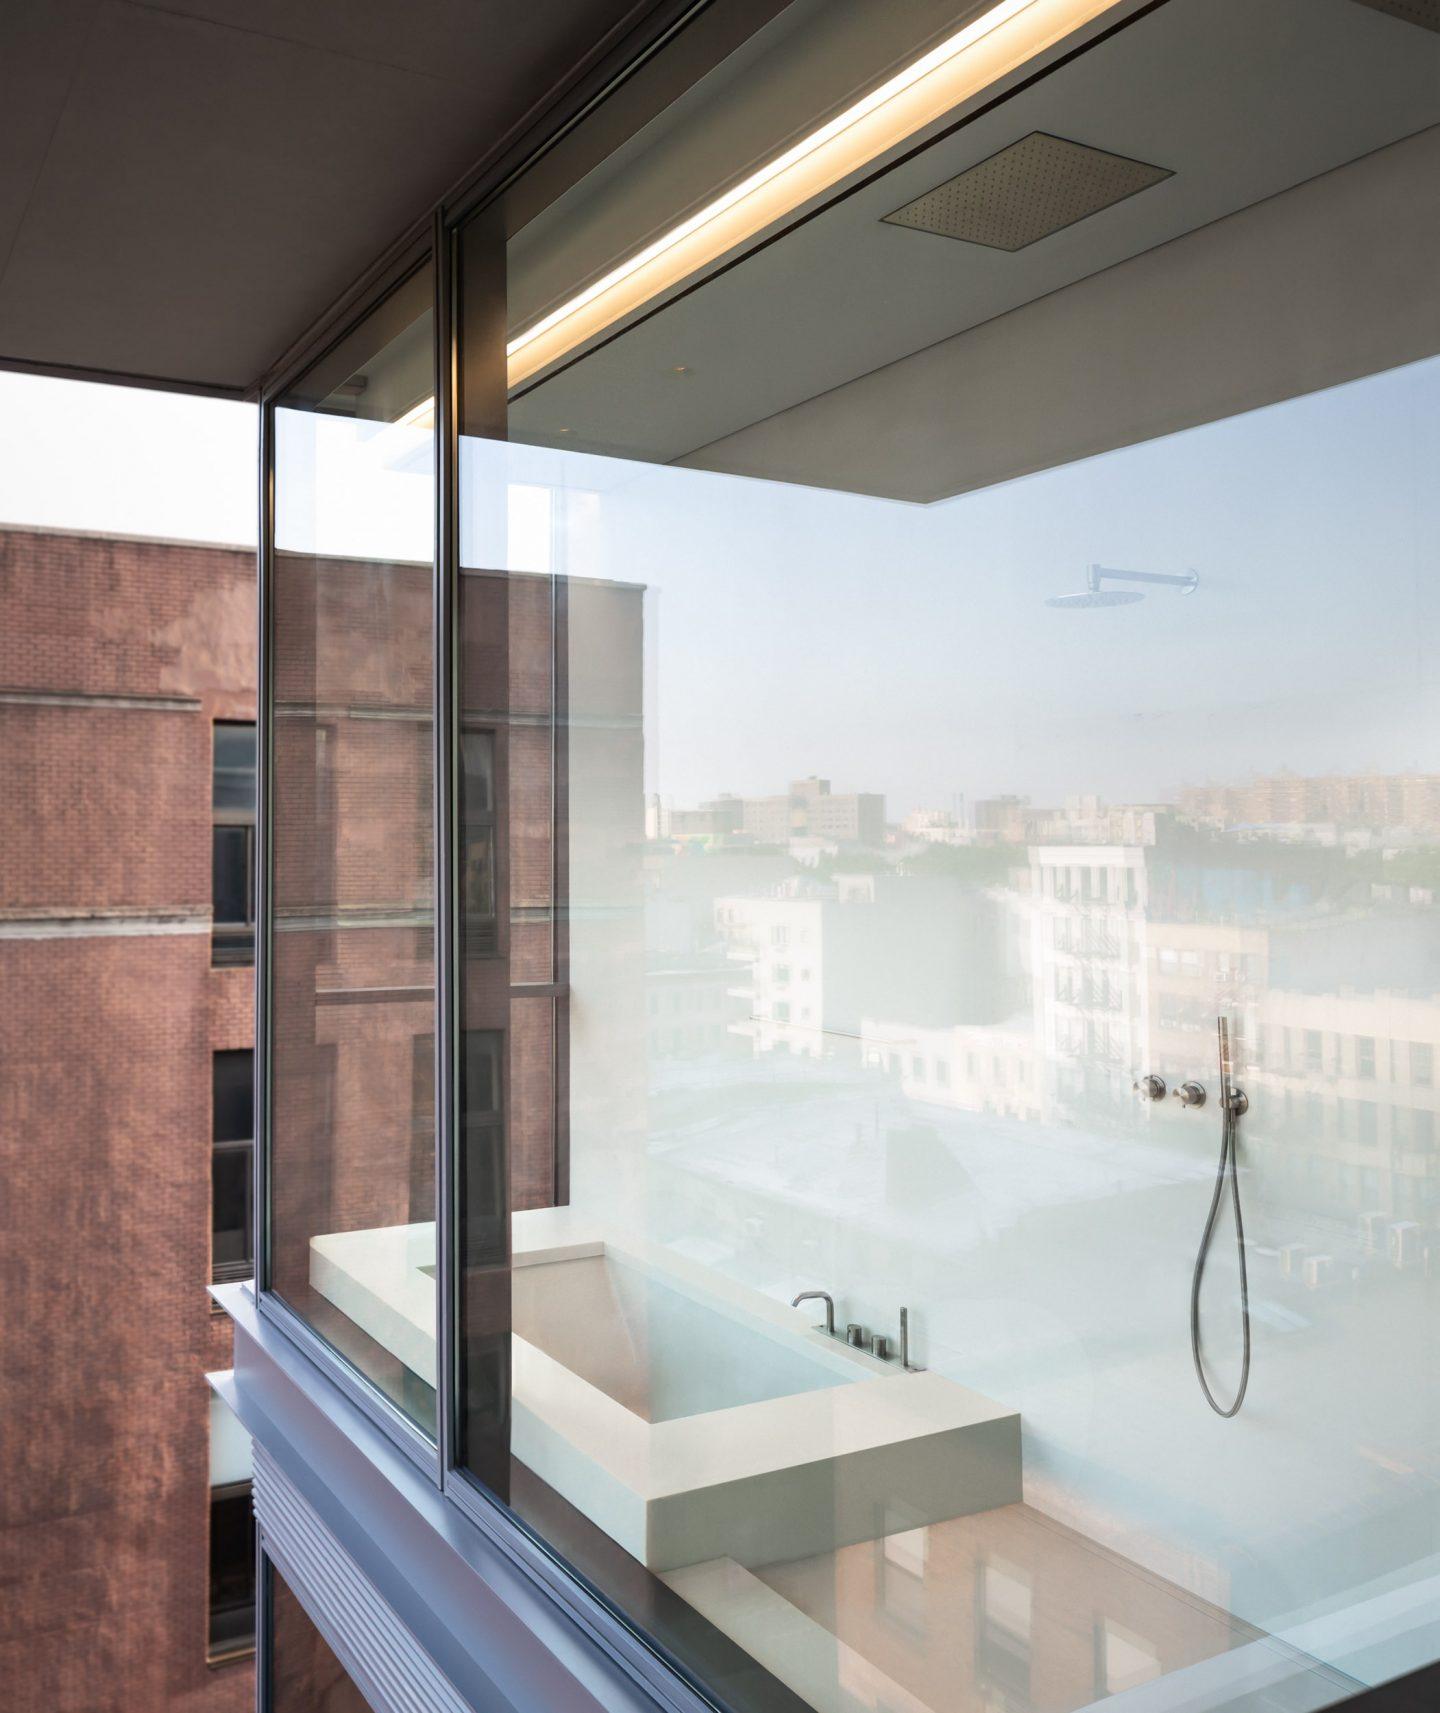 IGNANT-Architecture-Tadao-Ando-Penthouse-Eric-Petschek-012